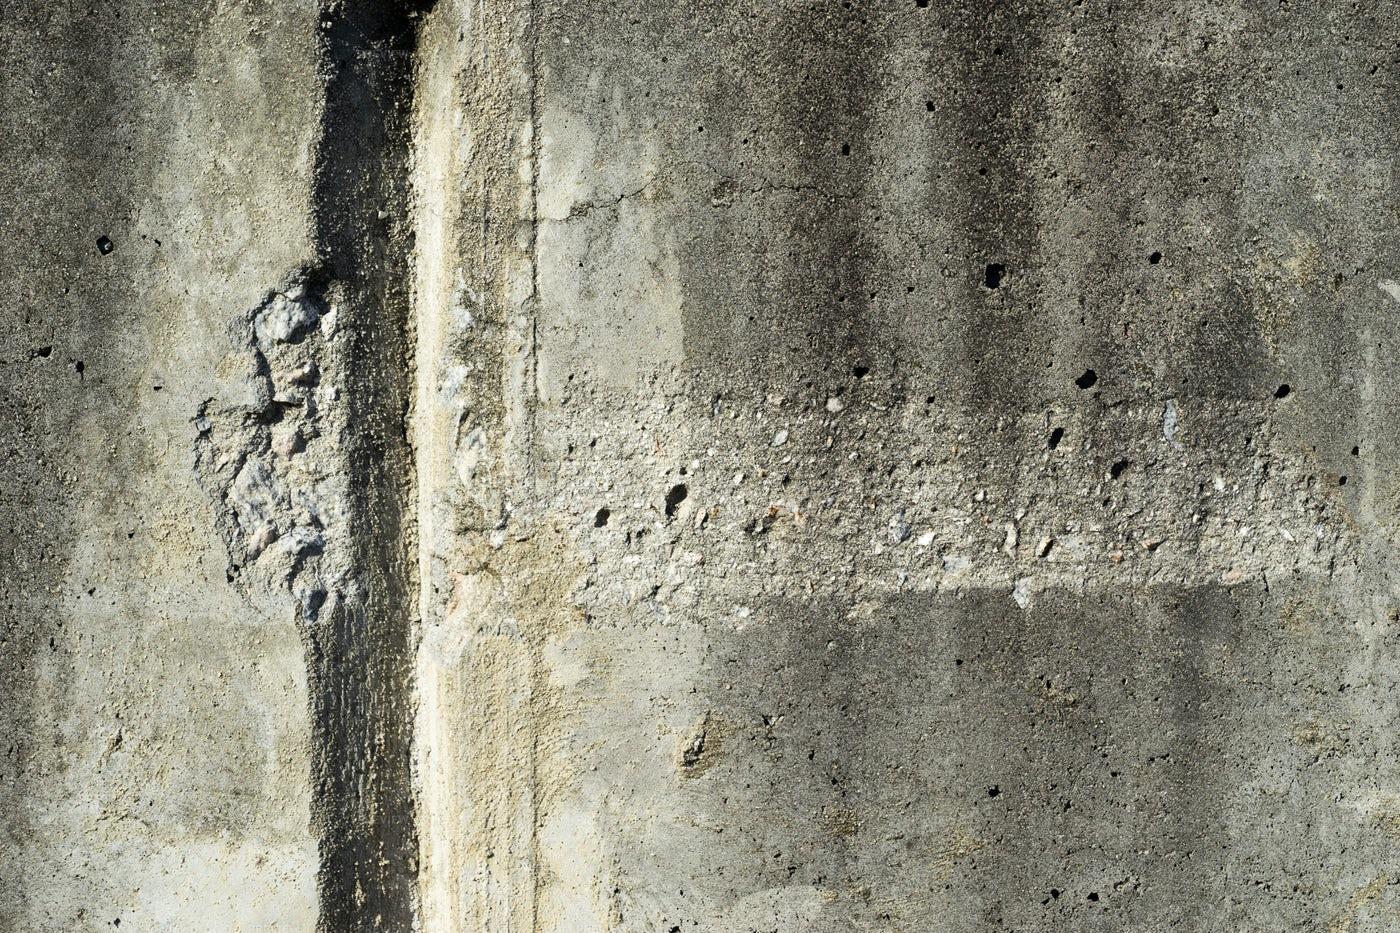 Scratched Concrete: Stock Photos